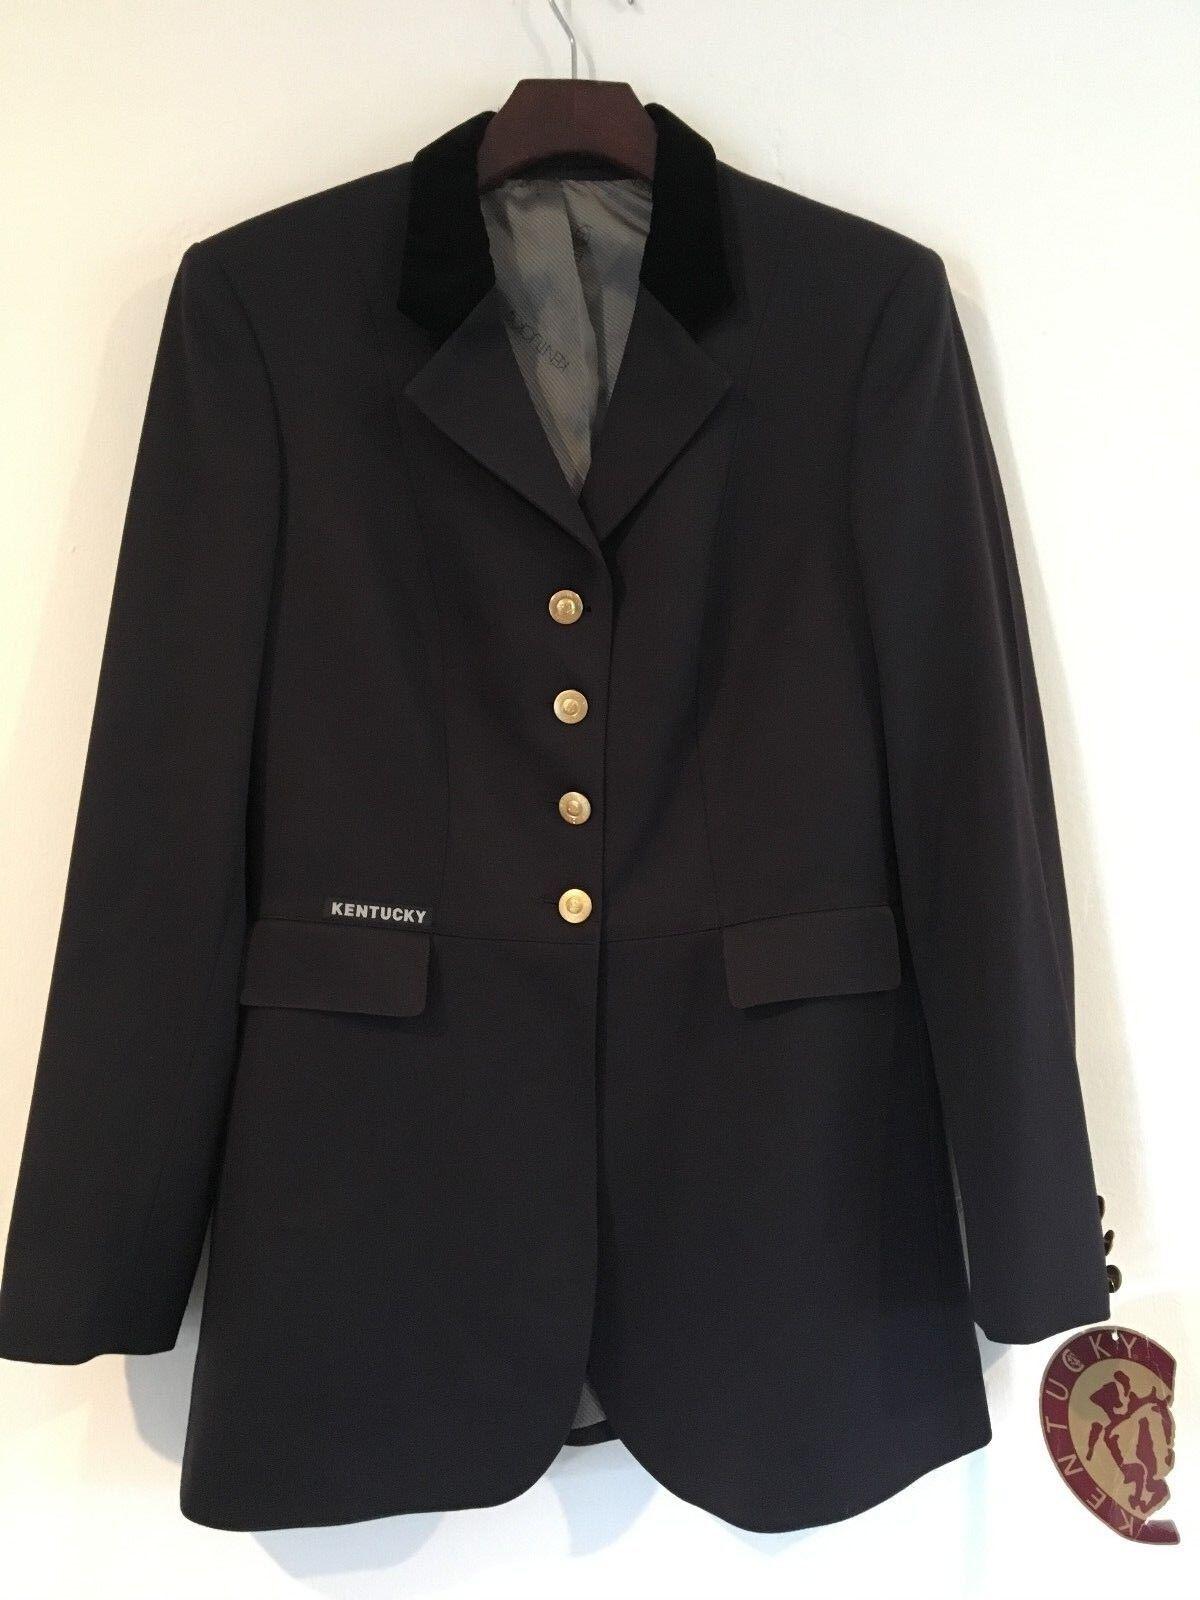 Dressage show coat - Kentucky Concours Größe  German Größe 42 -  navy